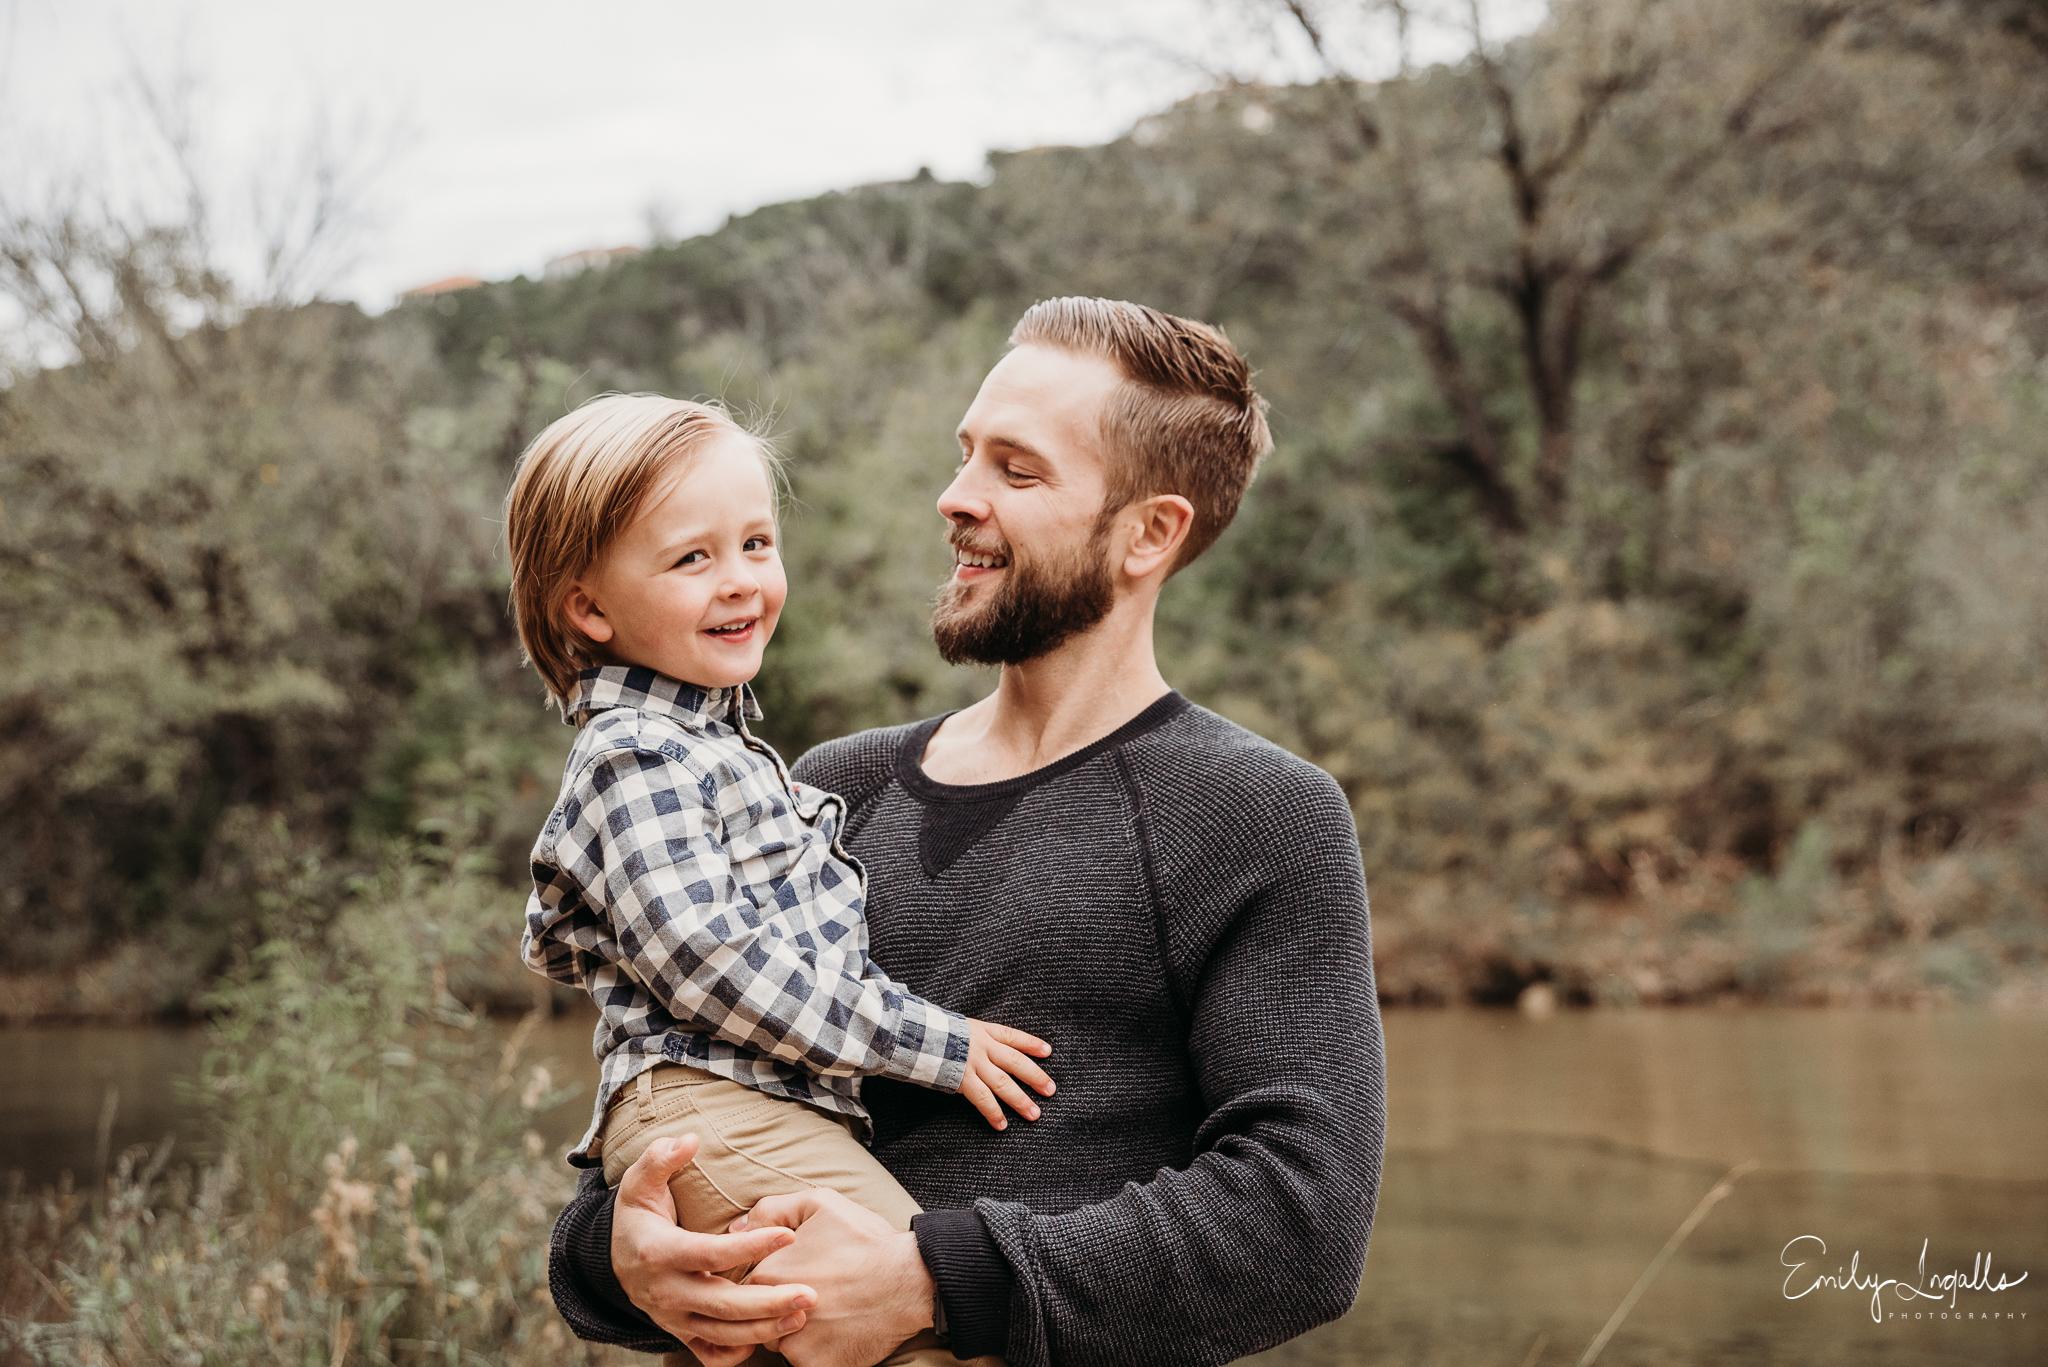 Family Photographer_Round Rock Photographer_Emily Ingalls Photography_Austin Photographer_Pflugerville Photographer_Georgetown Photographer-24.jpg